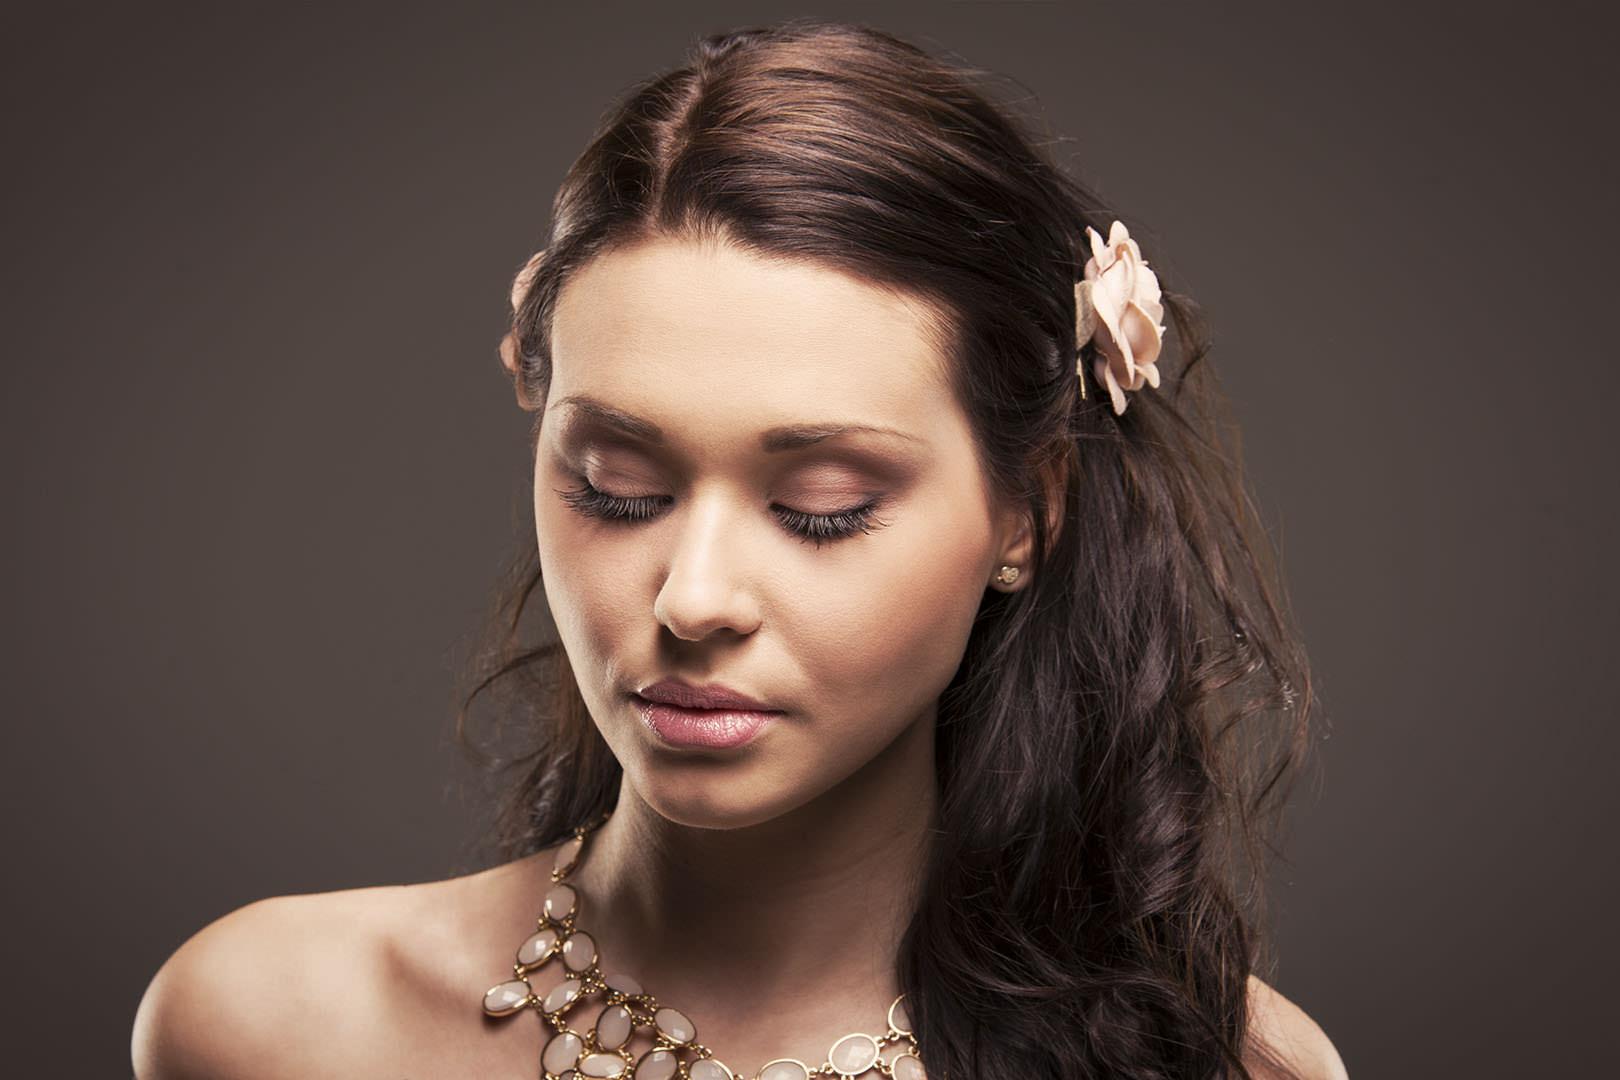 Magdalena_Dziadkowiak-Stefaniak_make_up_11